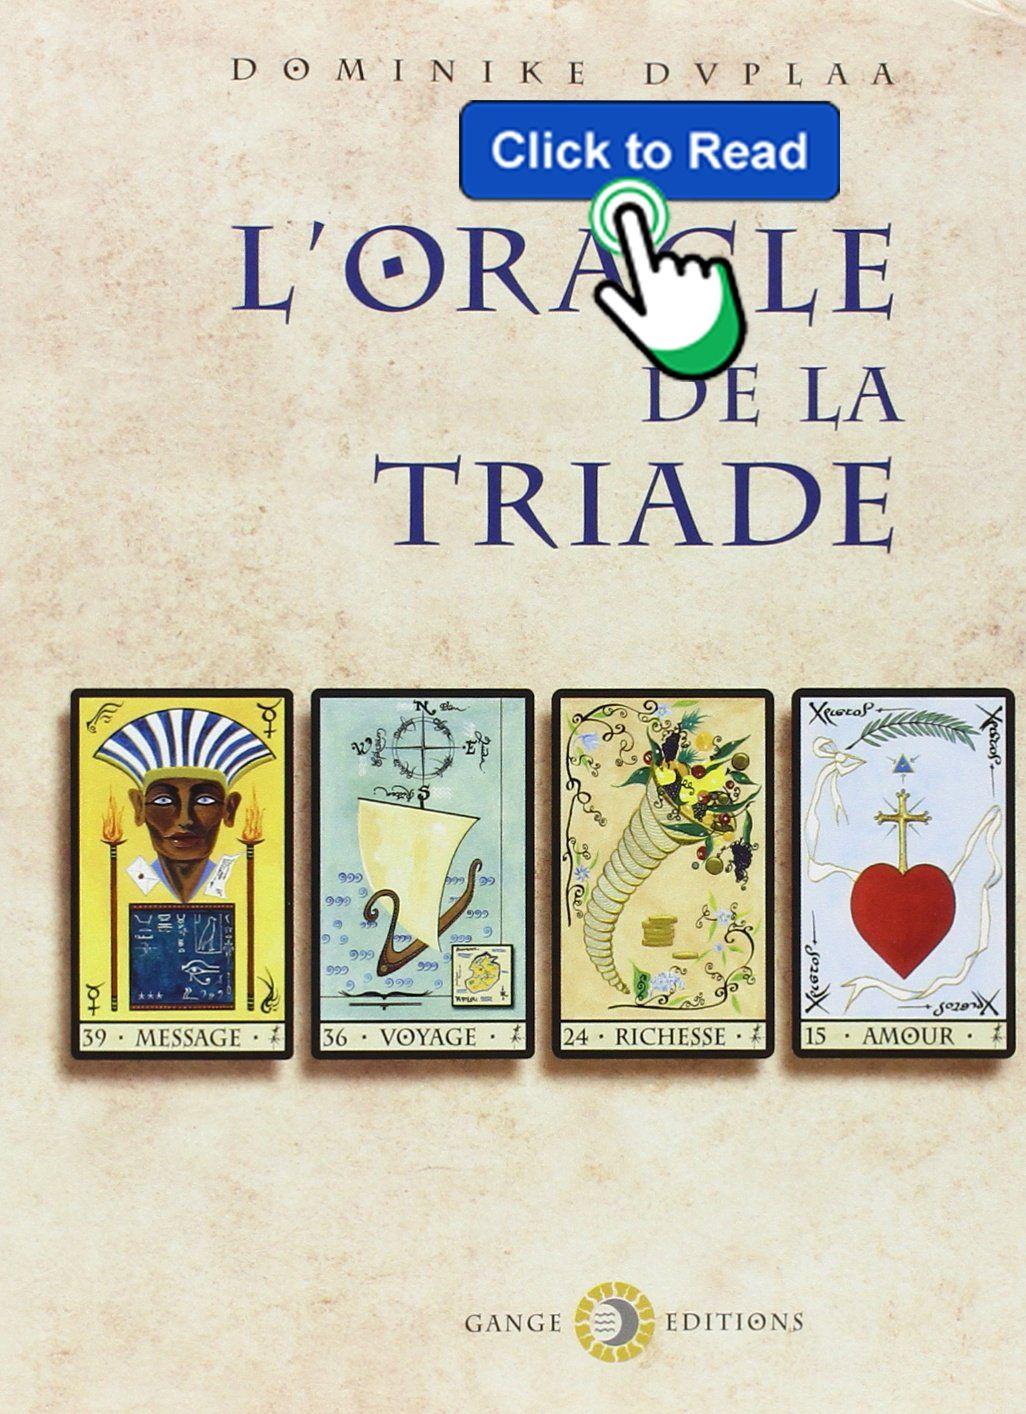 Livre Oracle De La Triade Pdf Gratuit : livre, oracle, triade, gratuit, Livres*, L'Oracle, Triade, Téléchargement, Gratuit, Livre, Oracle, Cards,, Cards